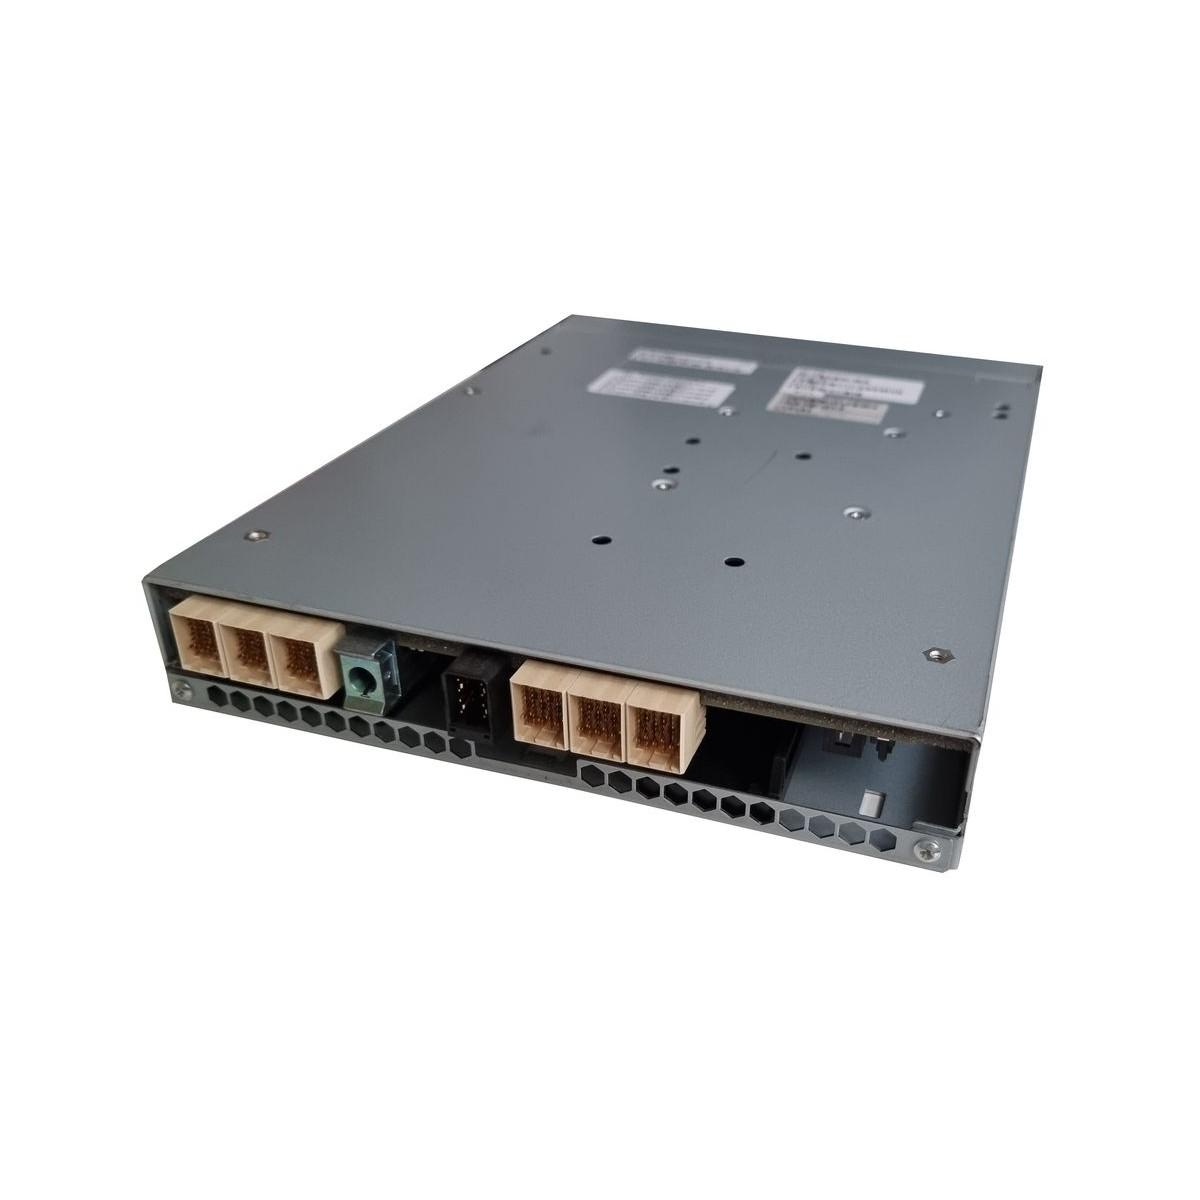 NVIDIA Quadro FX4600 768MB GDDR3 2xDVI TV OUT